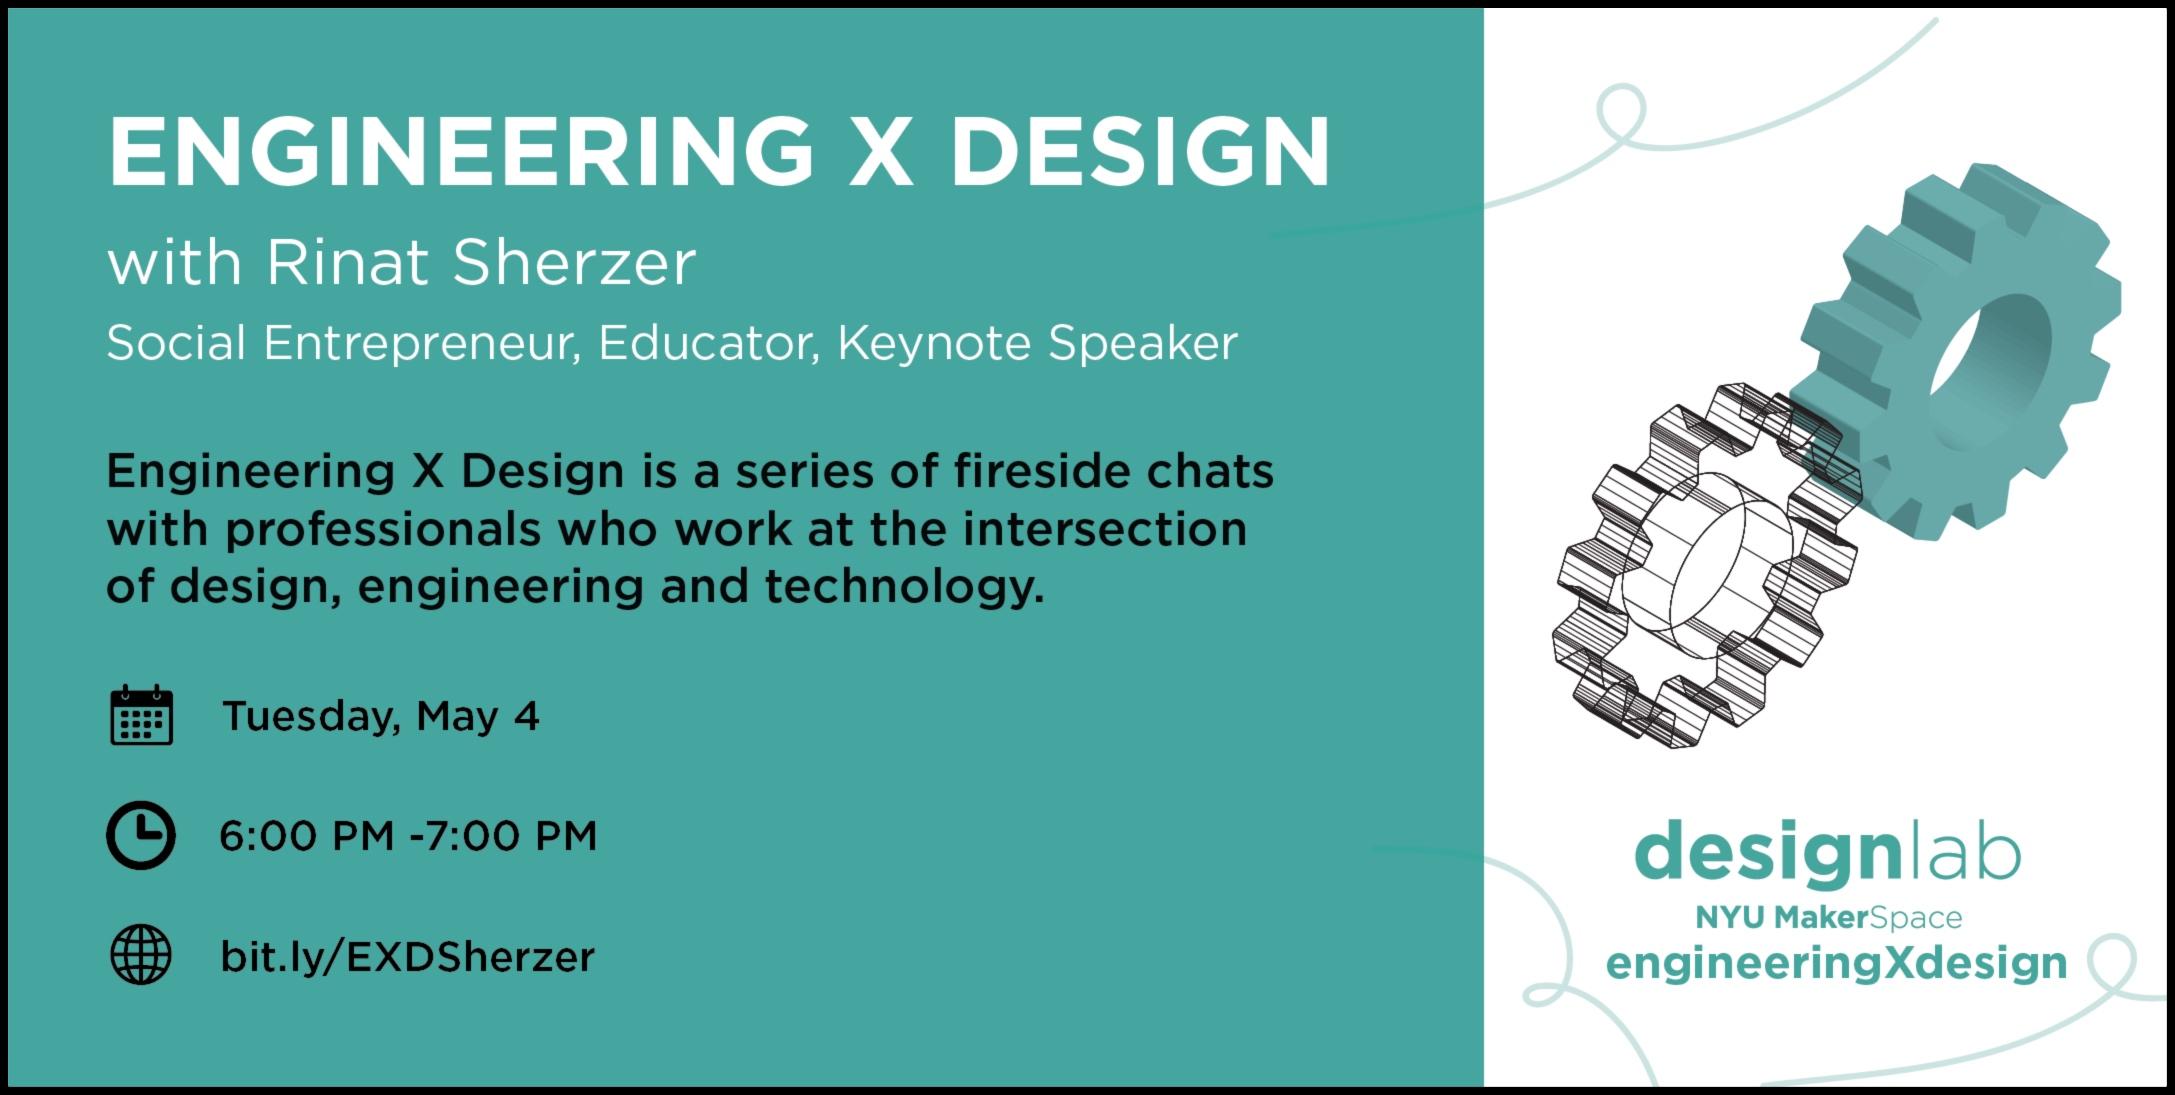 Engineering X Design Rinat Sherzer Flyer